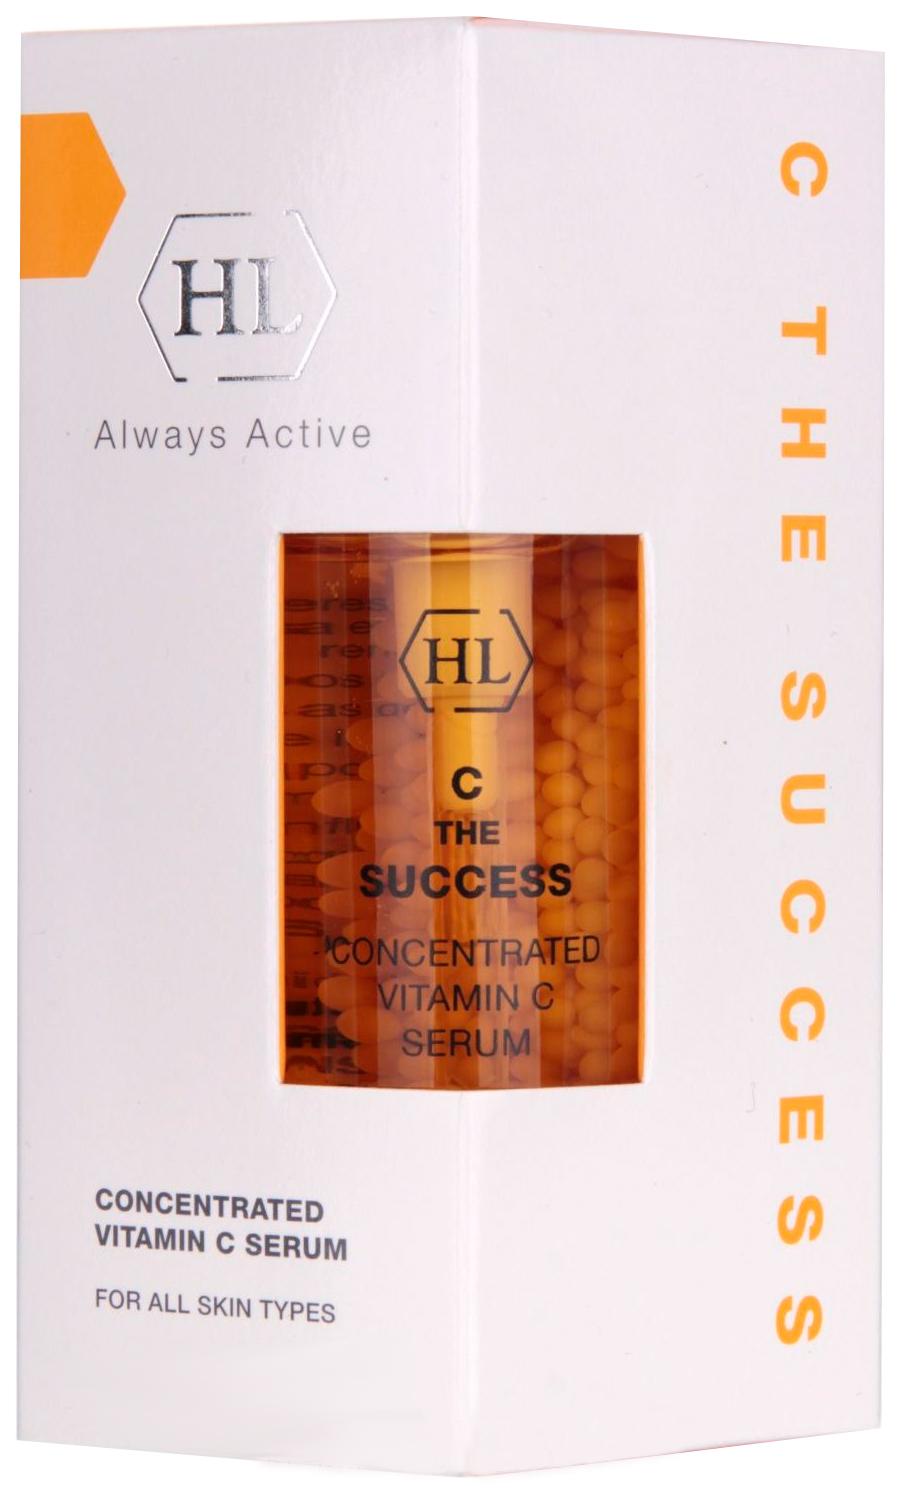 Сыворотка для лица Holy Land Concentrated vitamin C Serum 30 мл